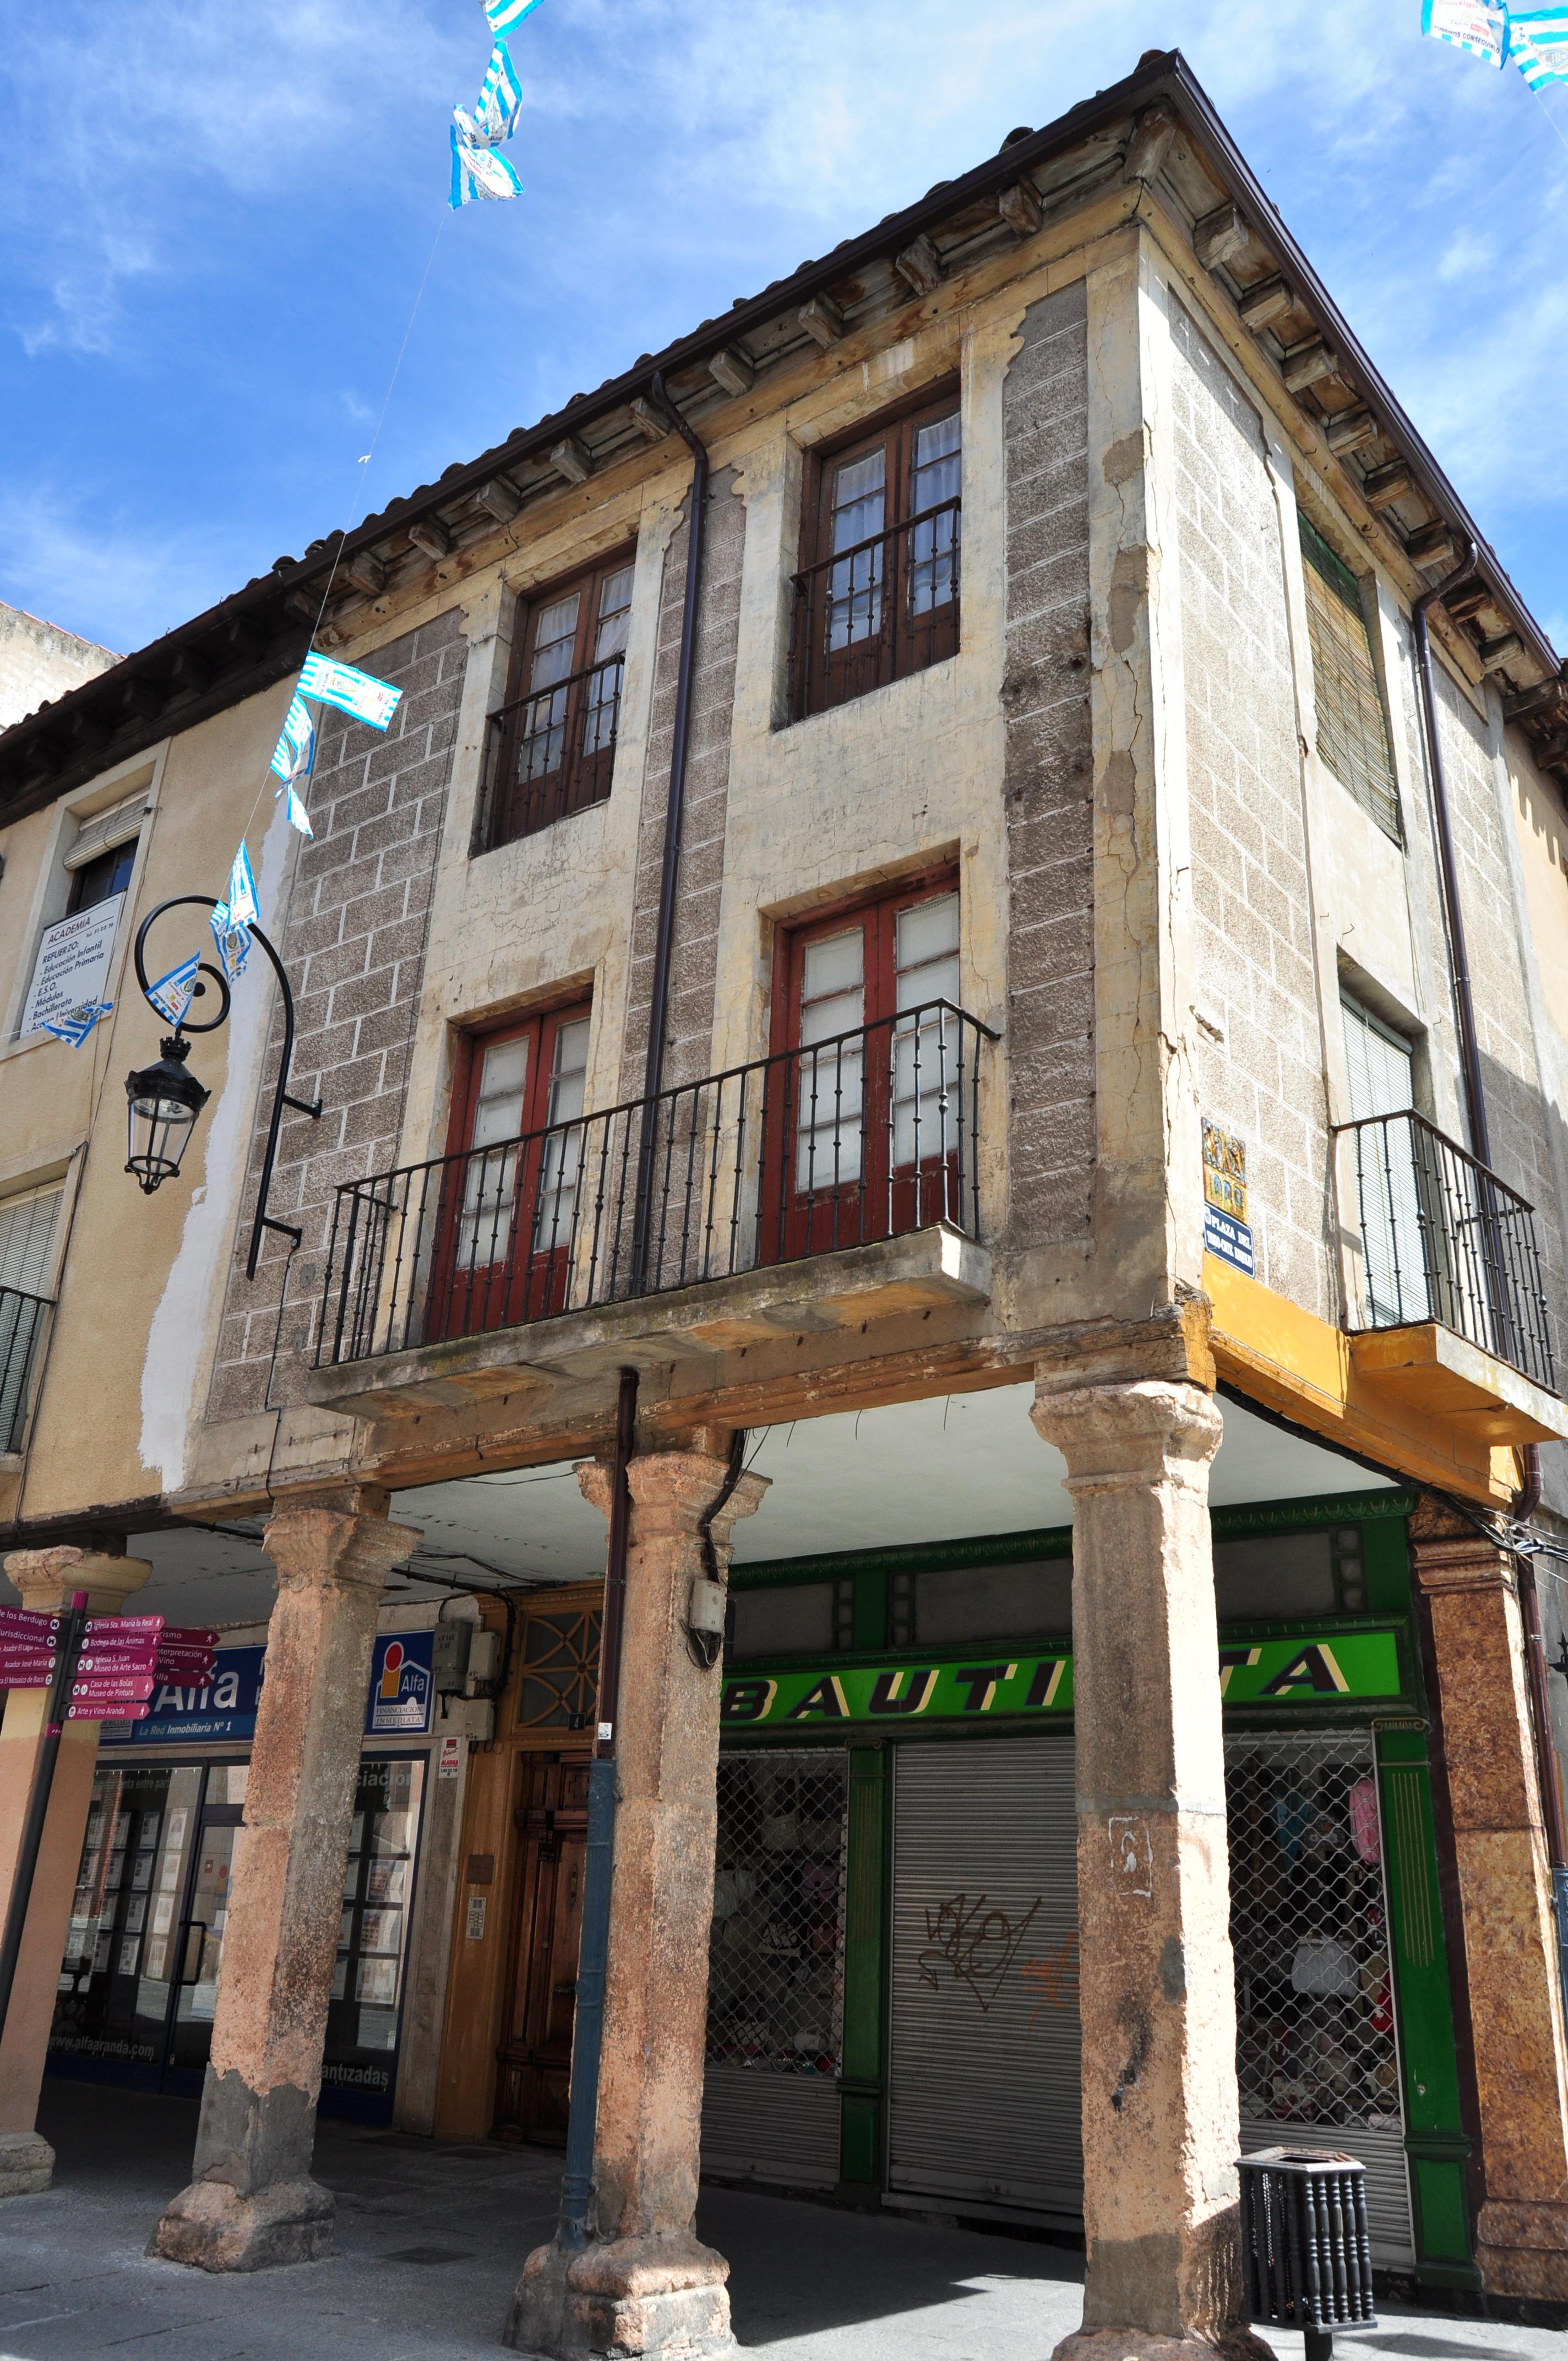 File Aranda De Duero 035 36570838982 Jpg Wikimedia Commons